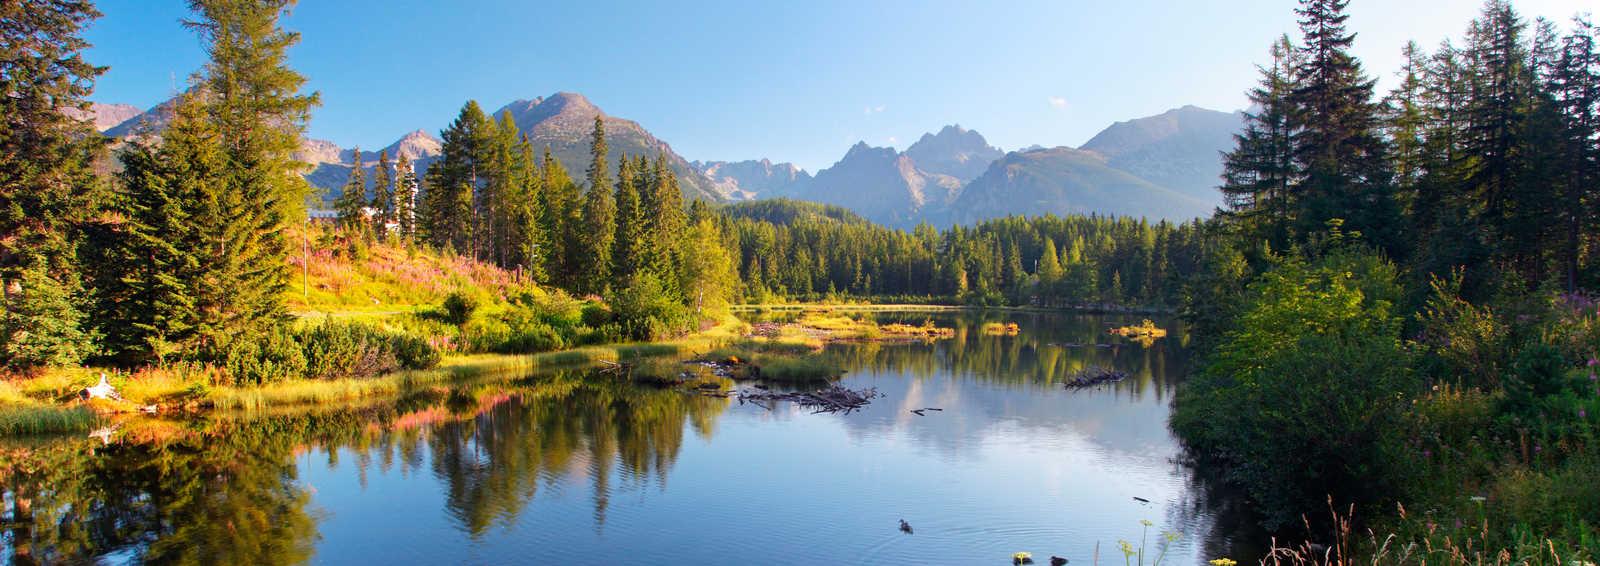 The lake Strbske pleso in Tatra mountains, Slovakia